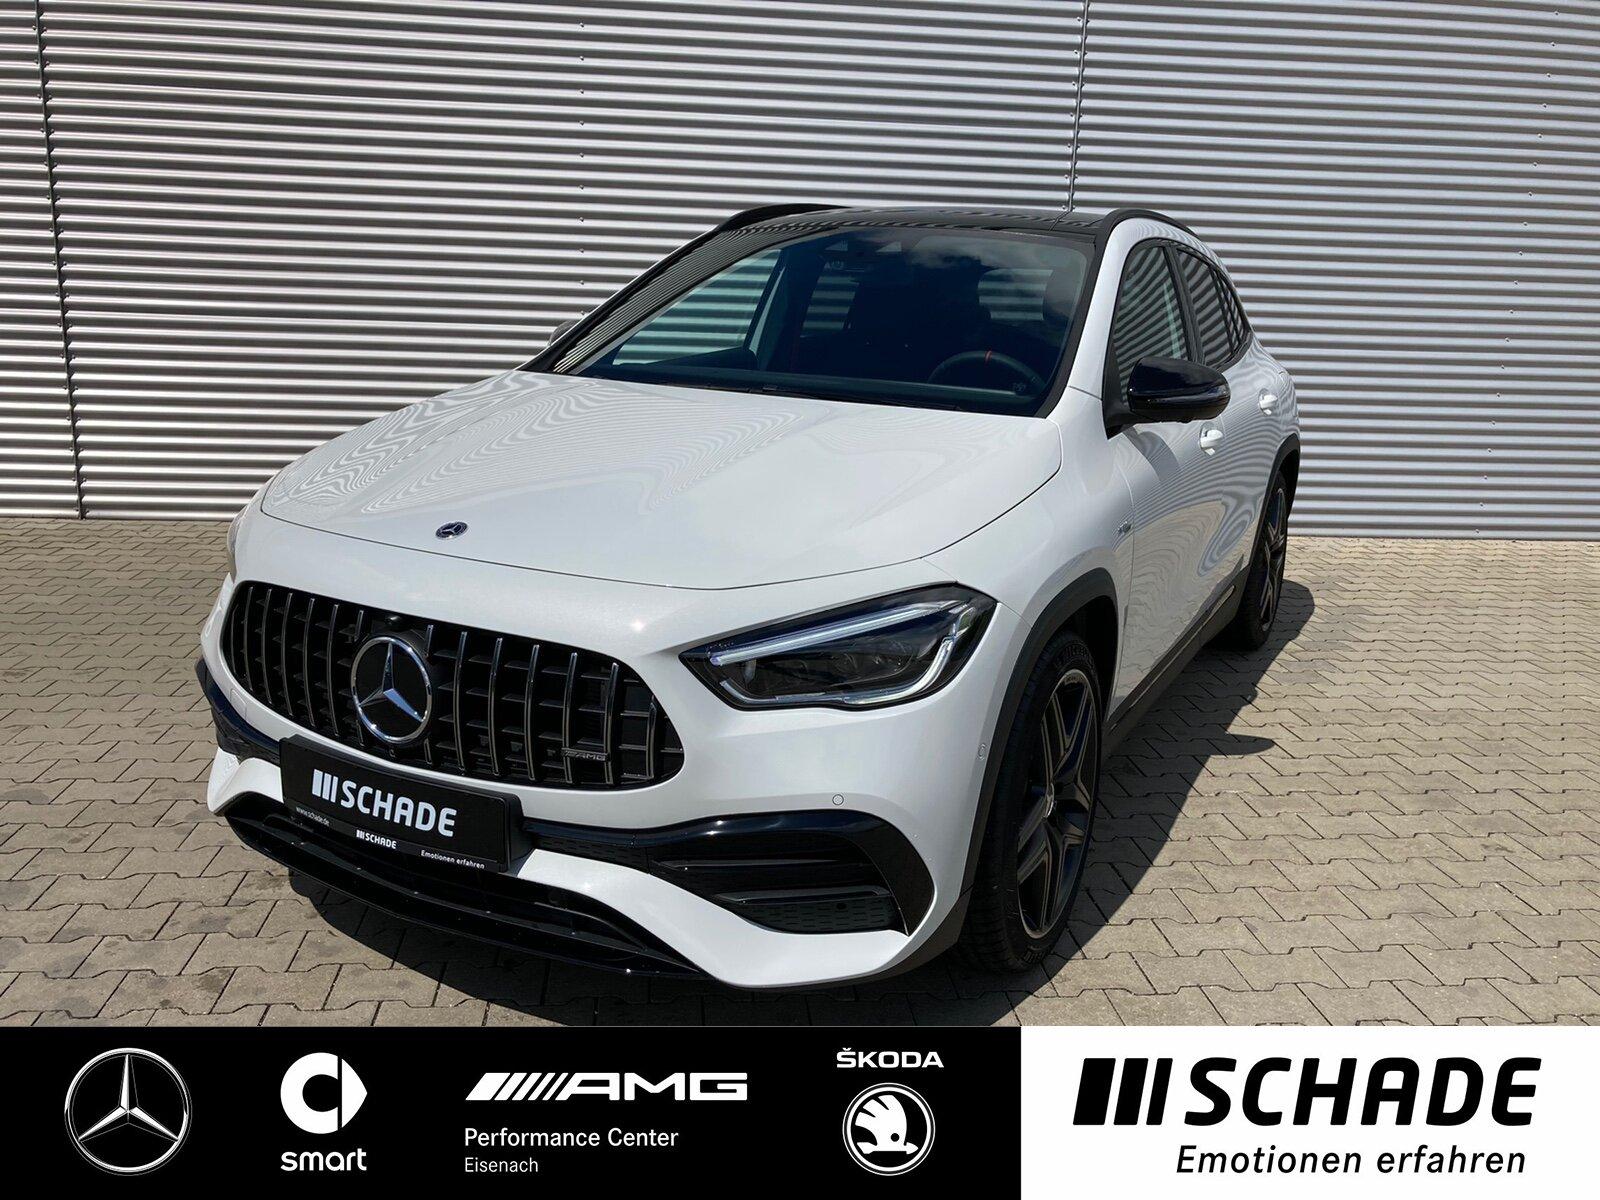 Mercedes-Benz GLA 35 AMG 4 MATIC MULTIBEAM*AHK*360°*Panoramad., Jahr 2021, Benzin